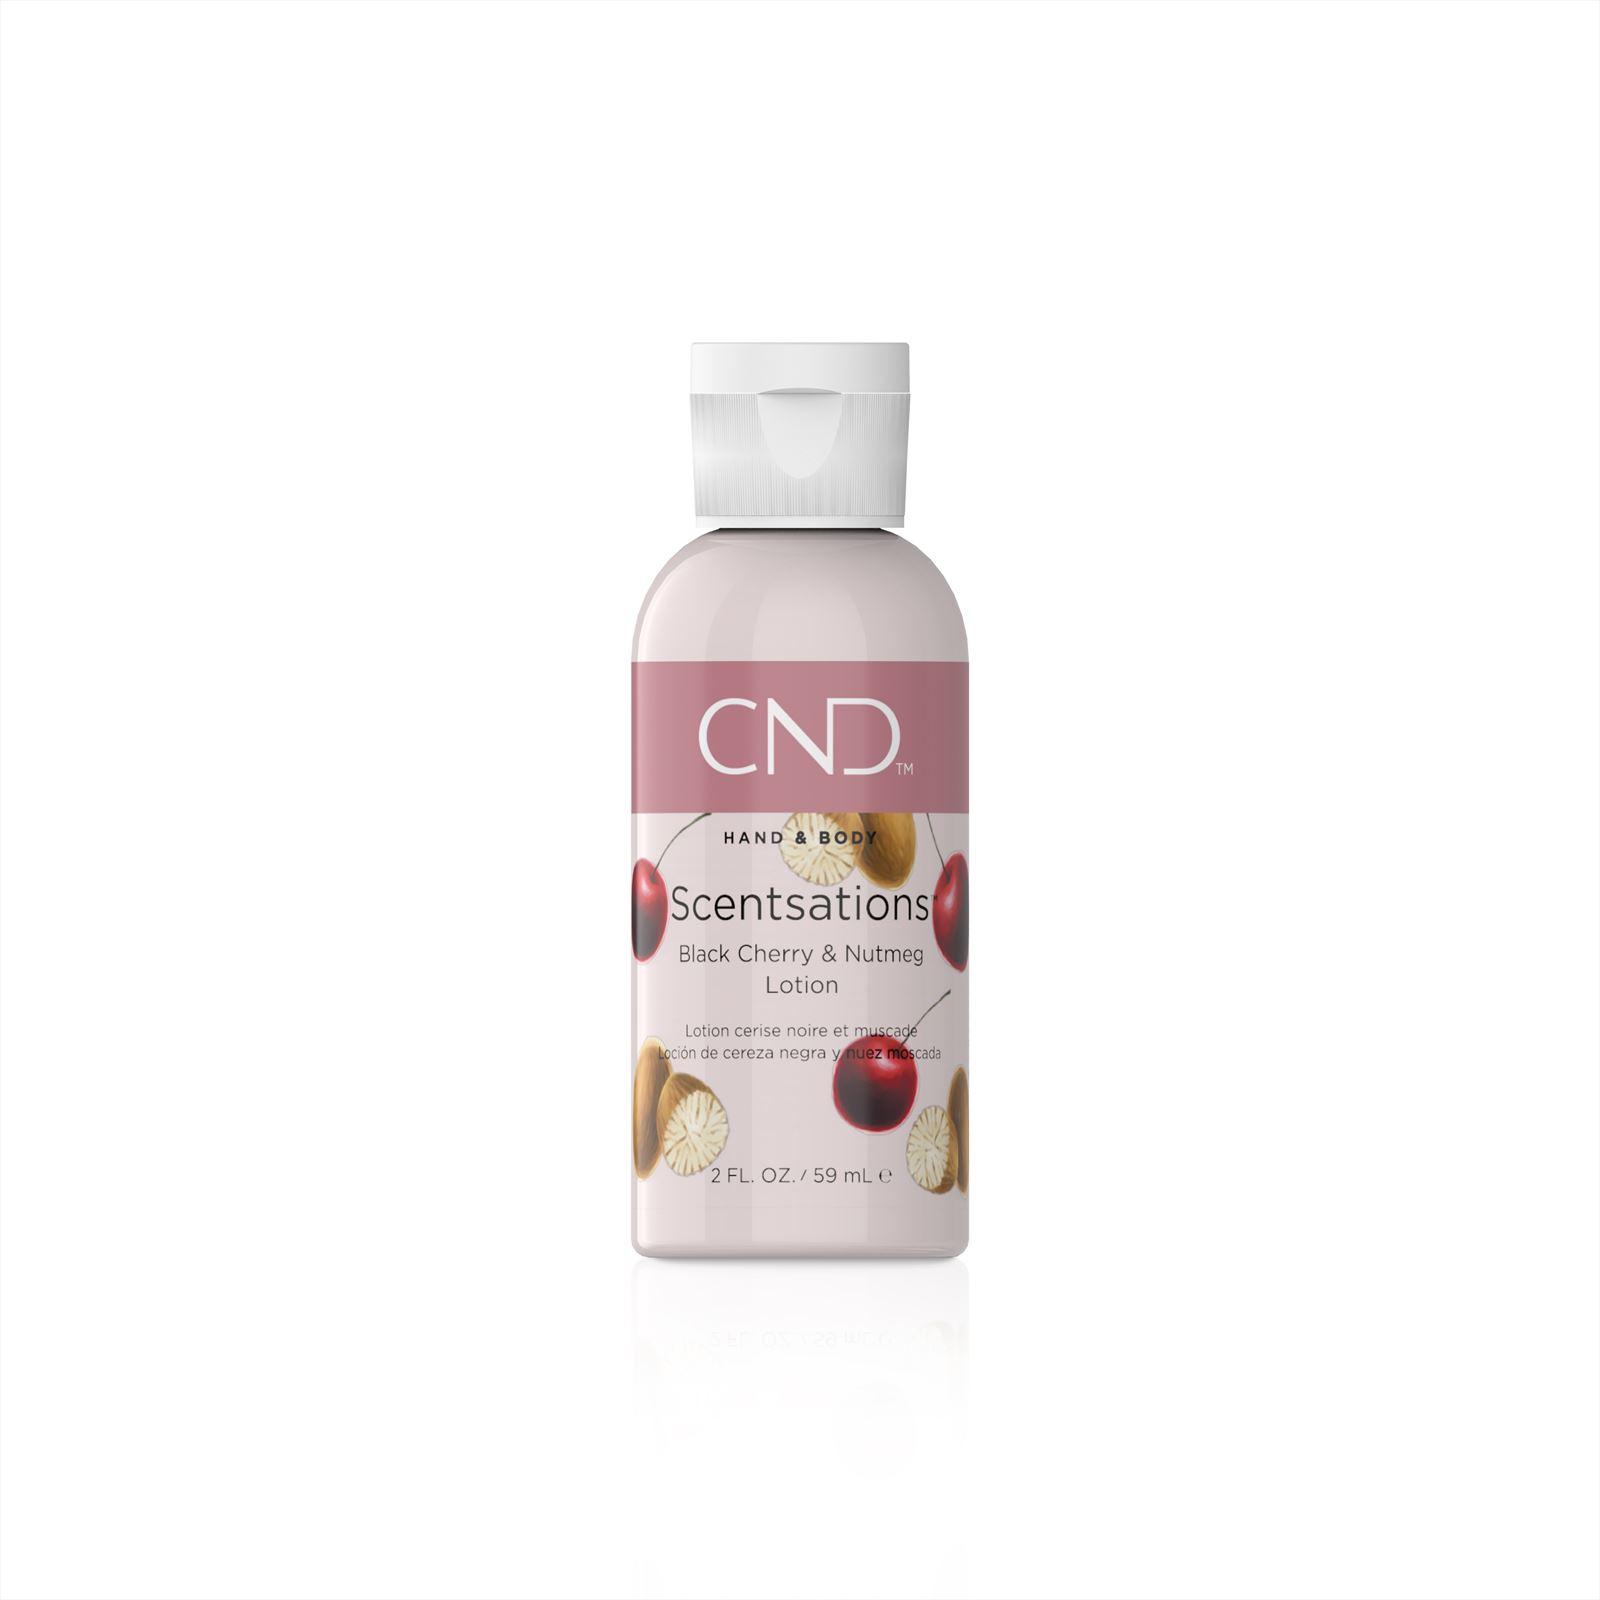 Afbeelding van CND ™ Scentsations Lotion - Black Cherry & Nutmeg 59 ml